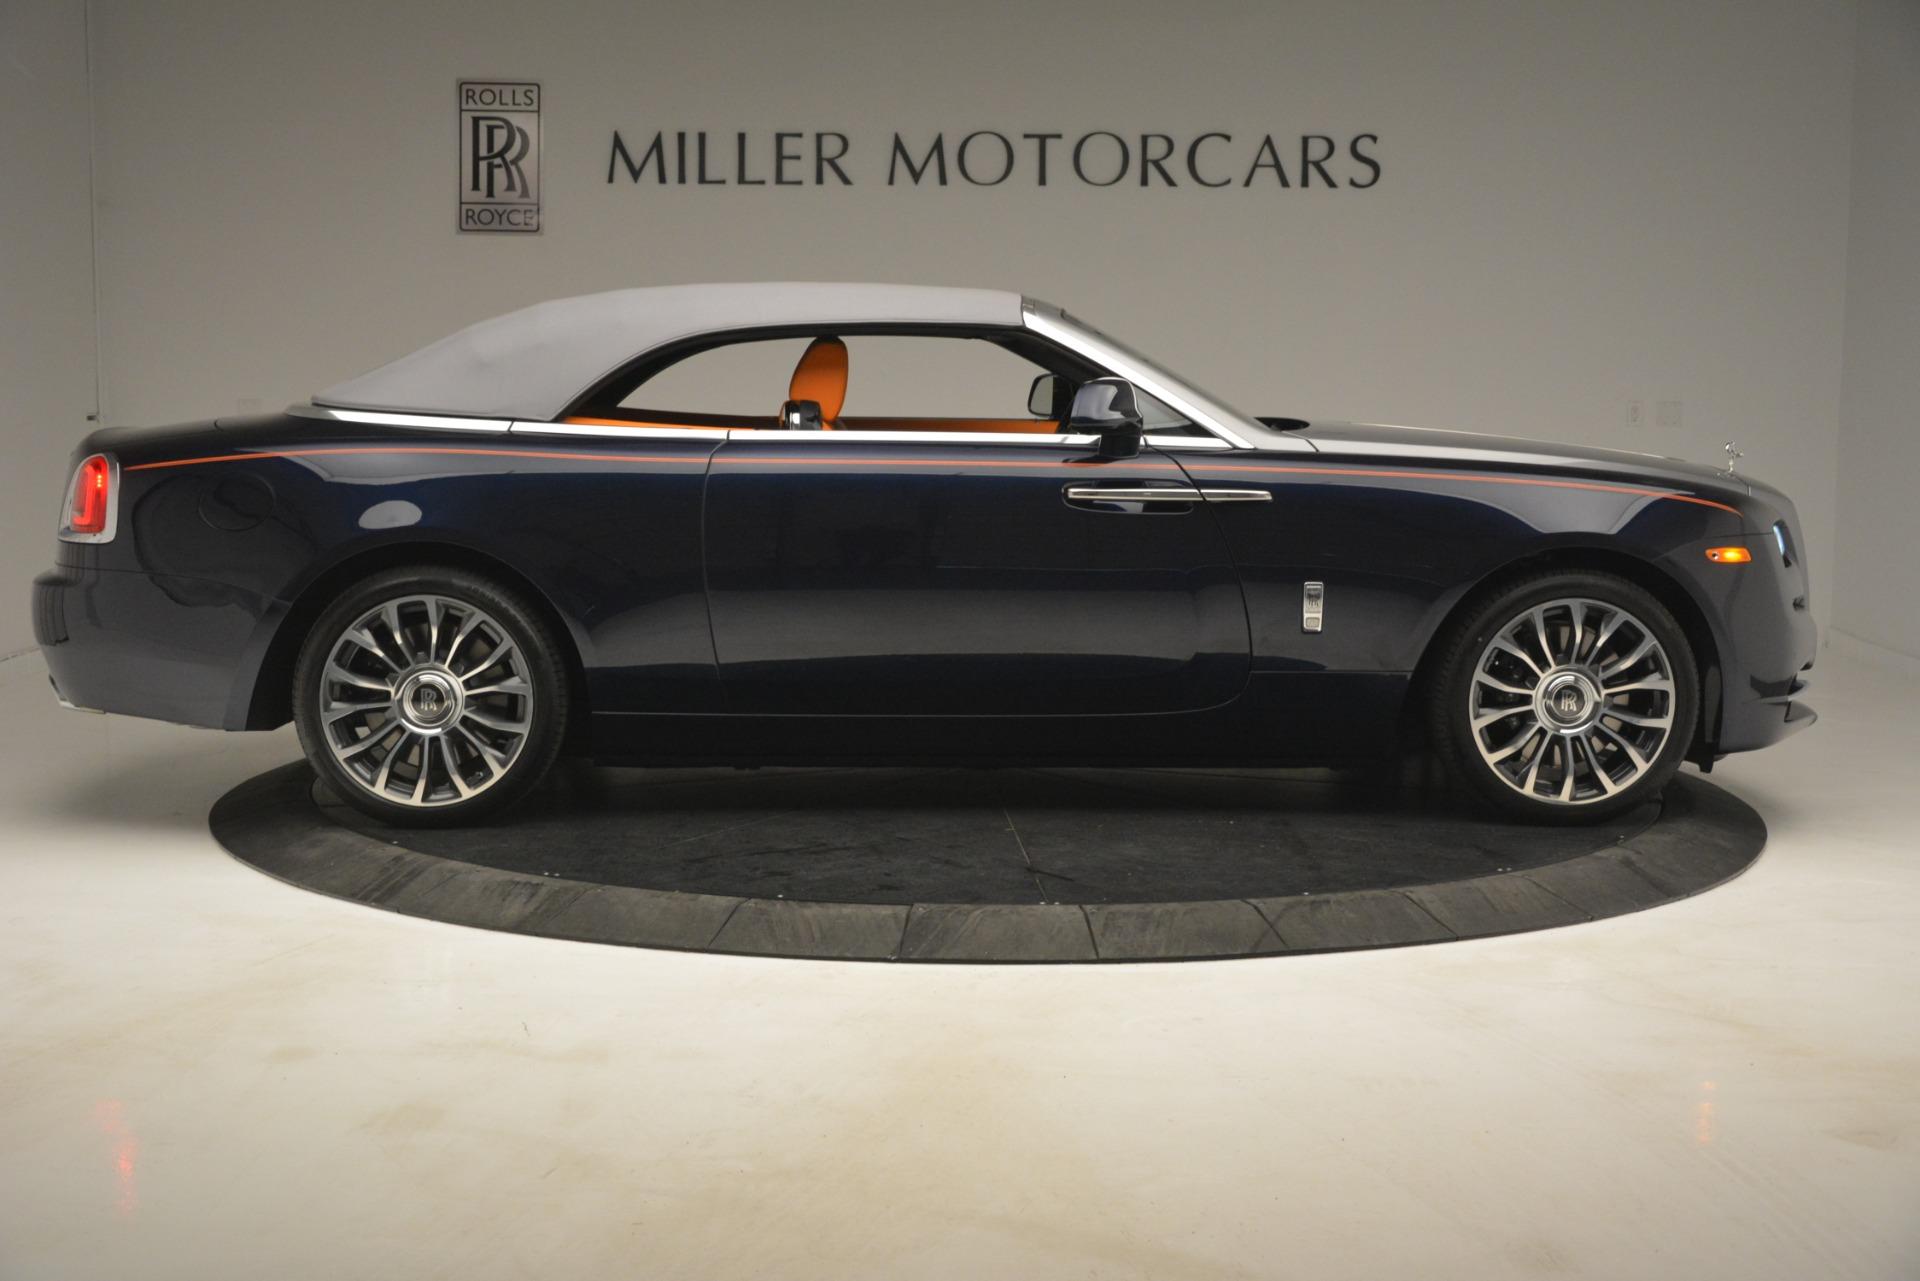 New 2019 Rolls-Royce Dawn  For Sale In Greenwich, CT 2701_p44